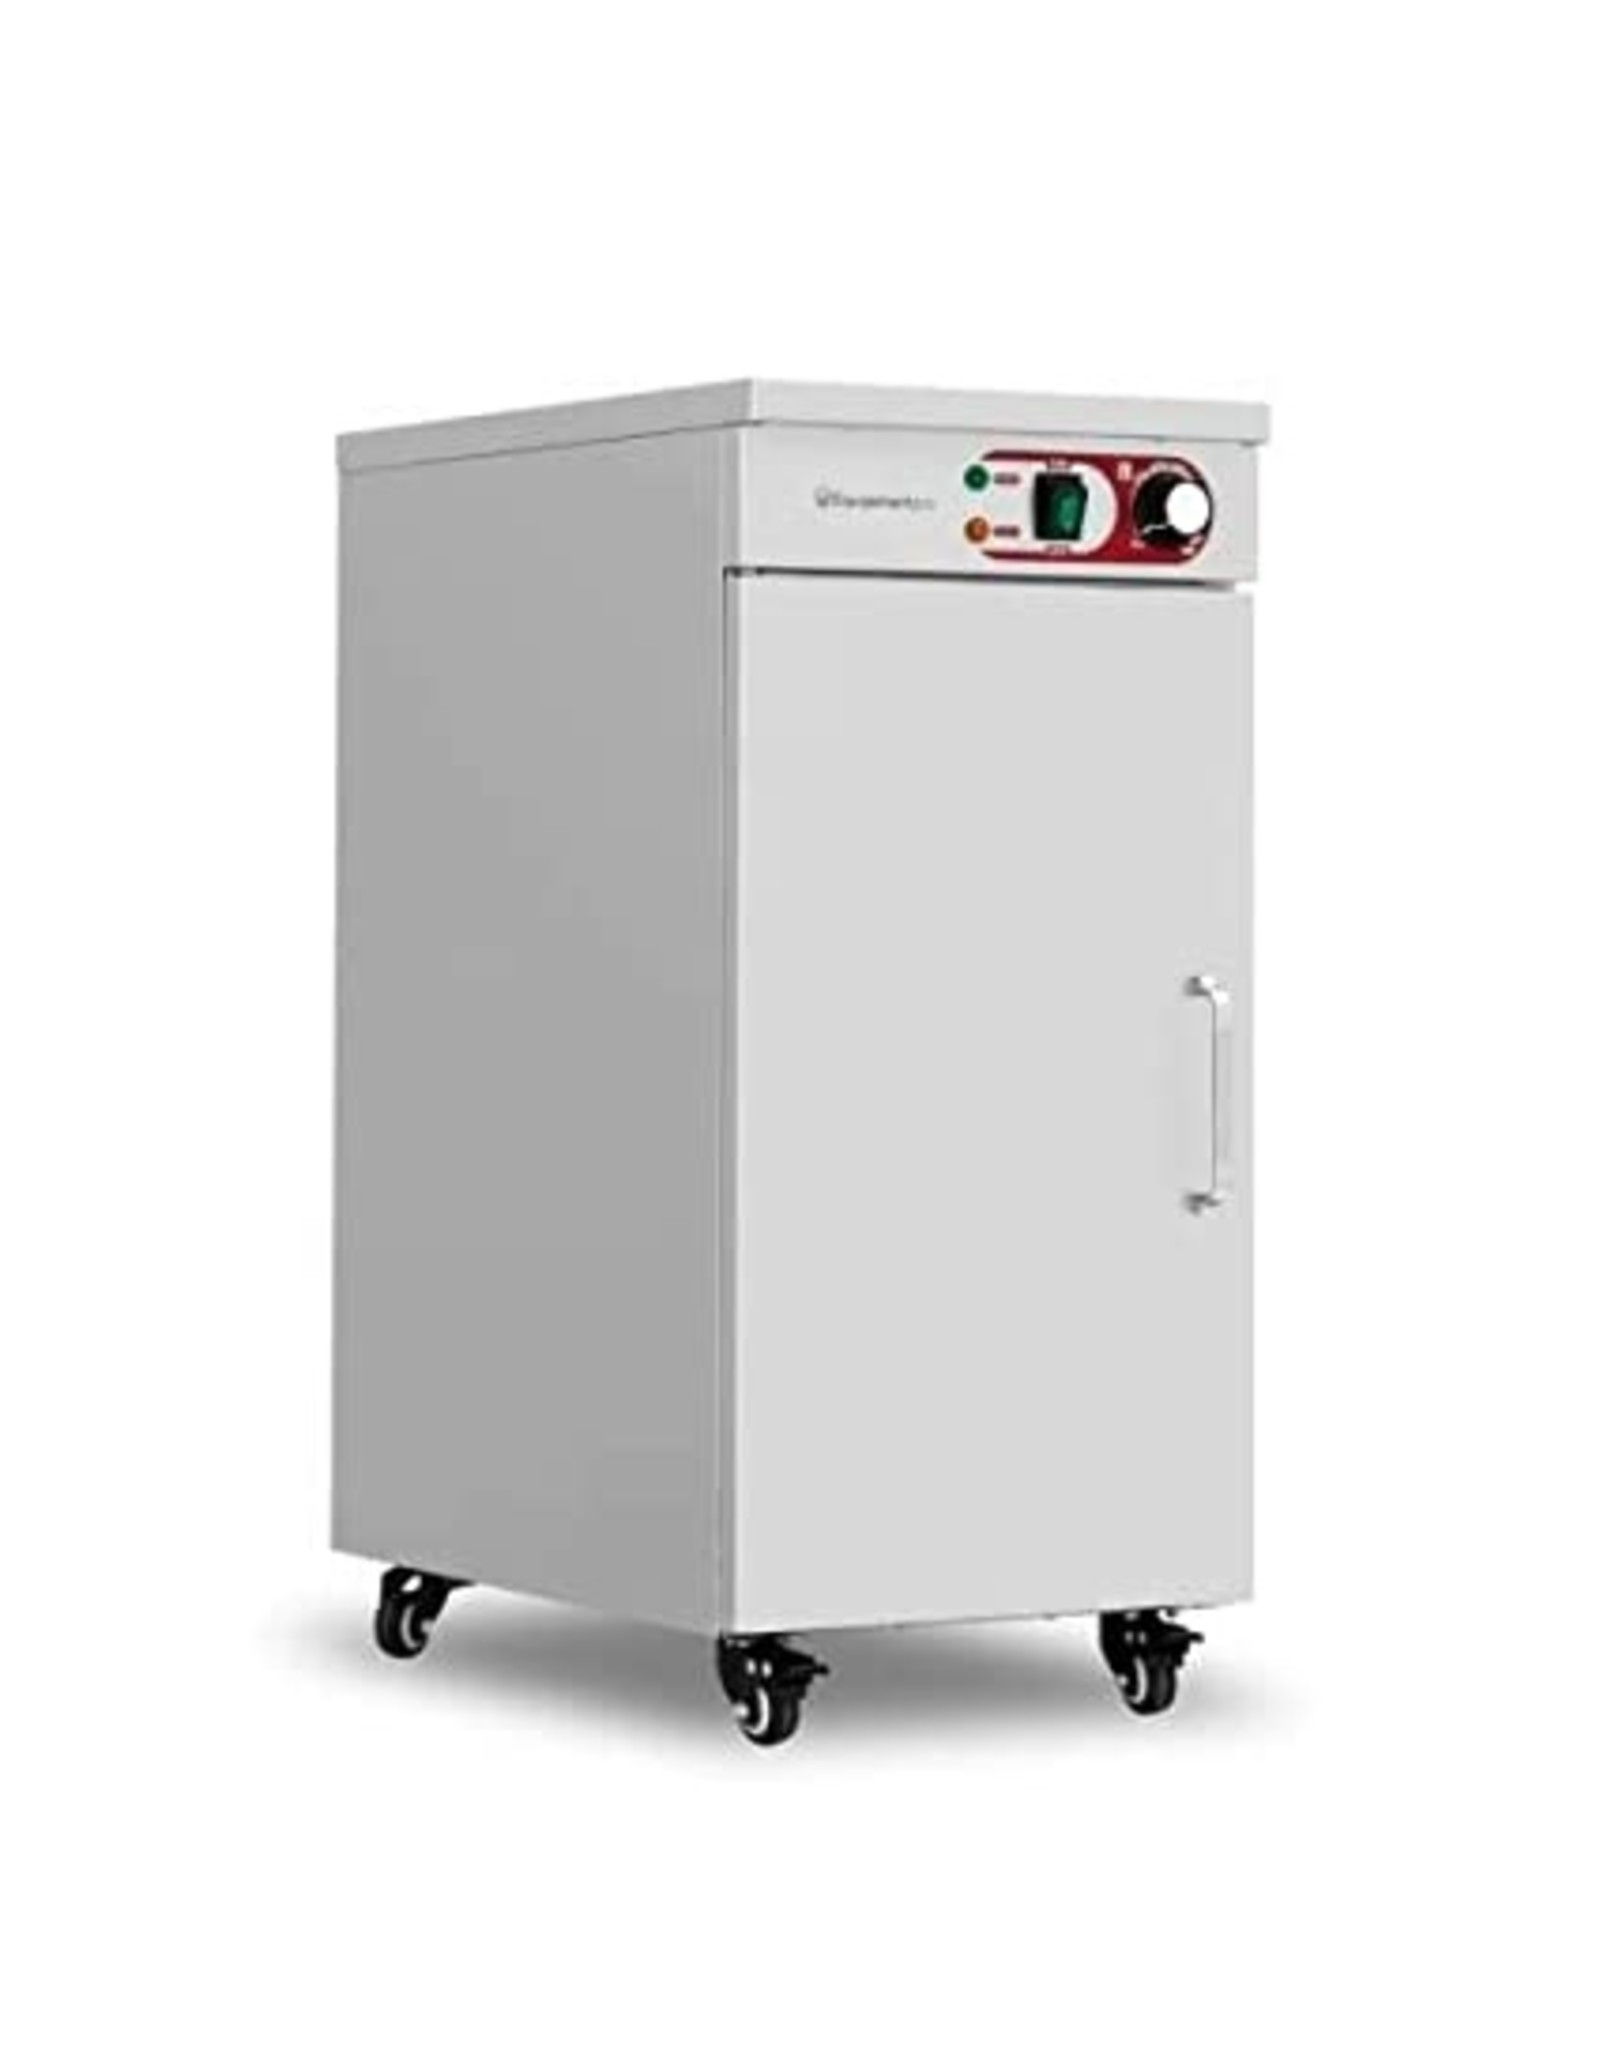 Q-Gastro Q-Gastro PW-60 Professionele Elektrische Bordenwarmer 230V (Nieuw)